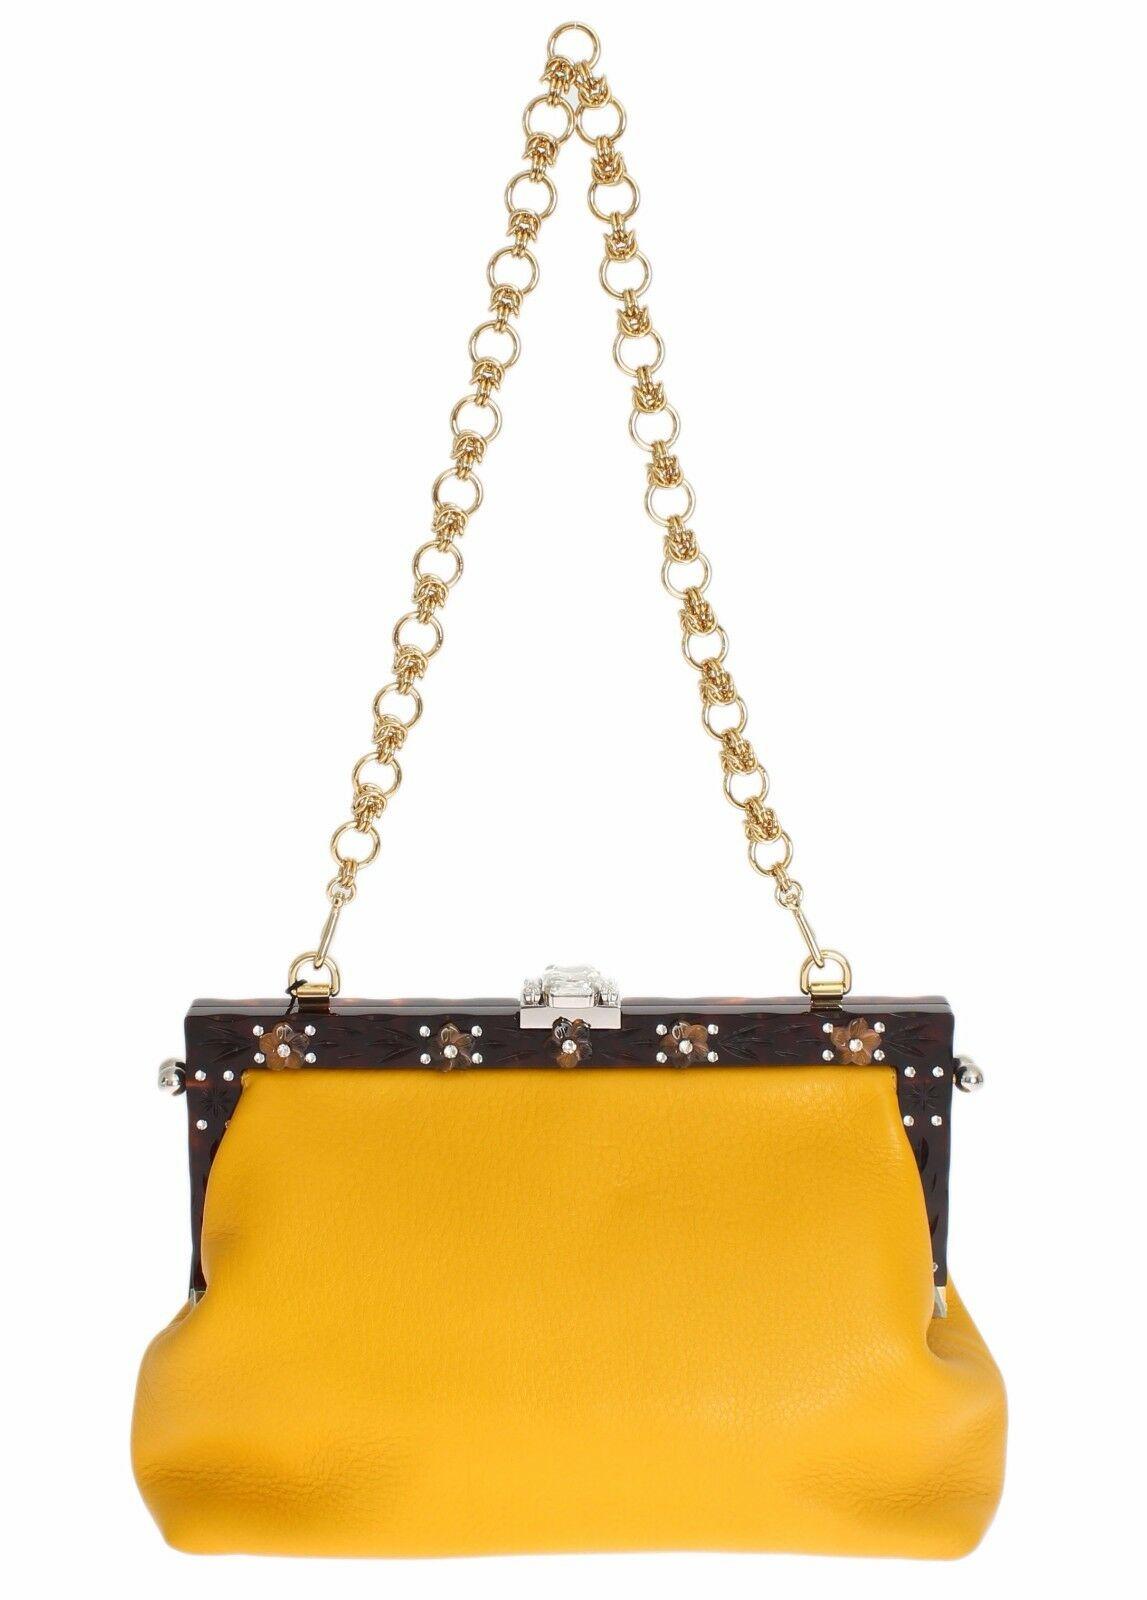 Dolce & Gabbana Women's Leather Crystal Shoulder Bag Yellow BOR10055